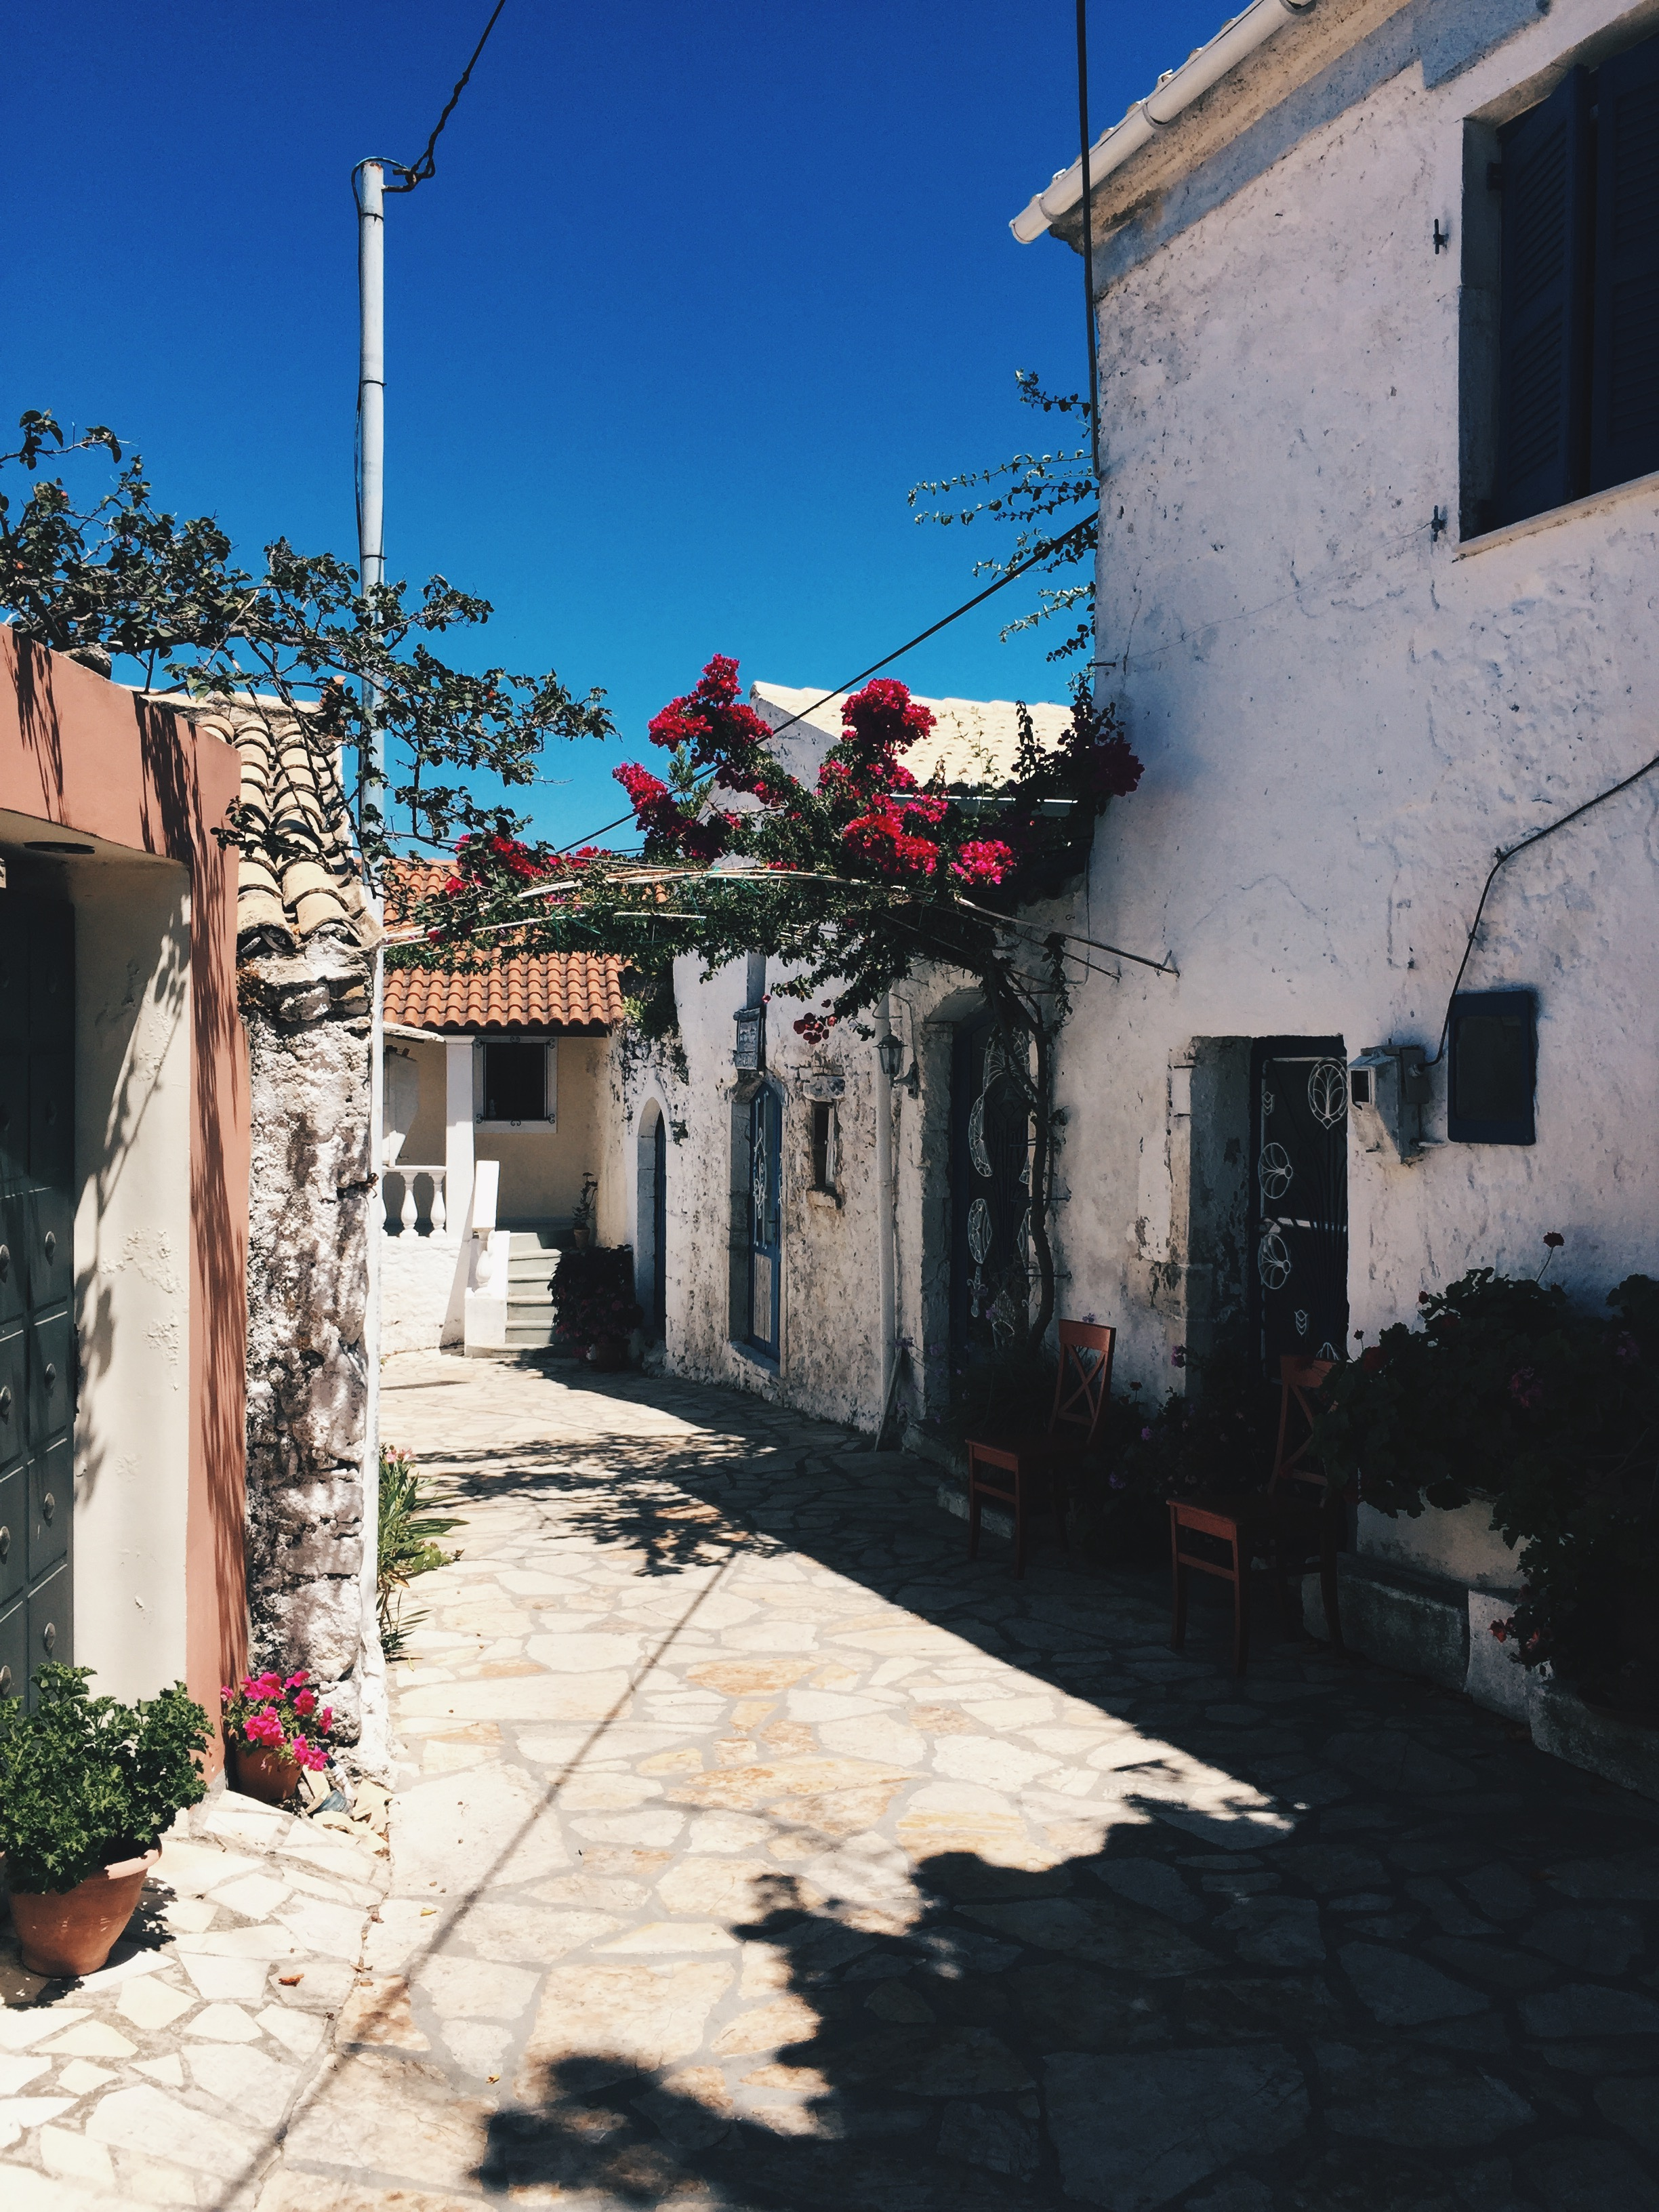 Quaint village named Afionas, Greece